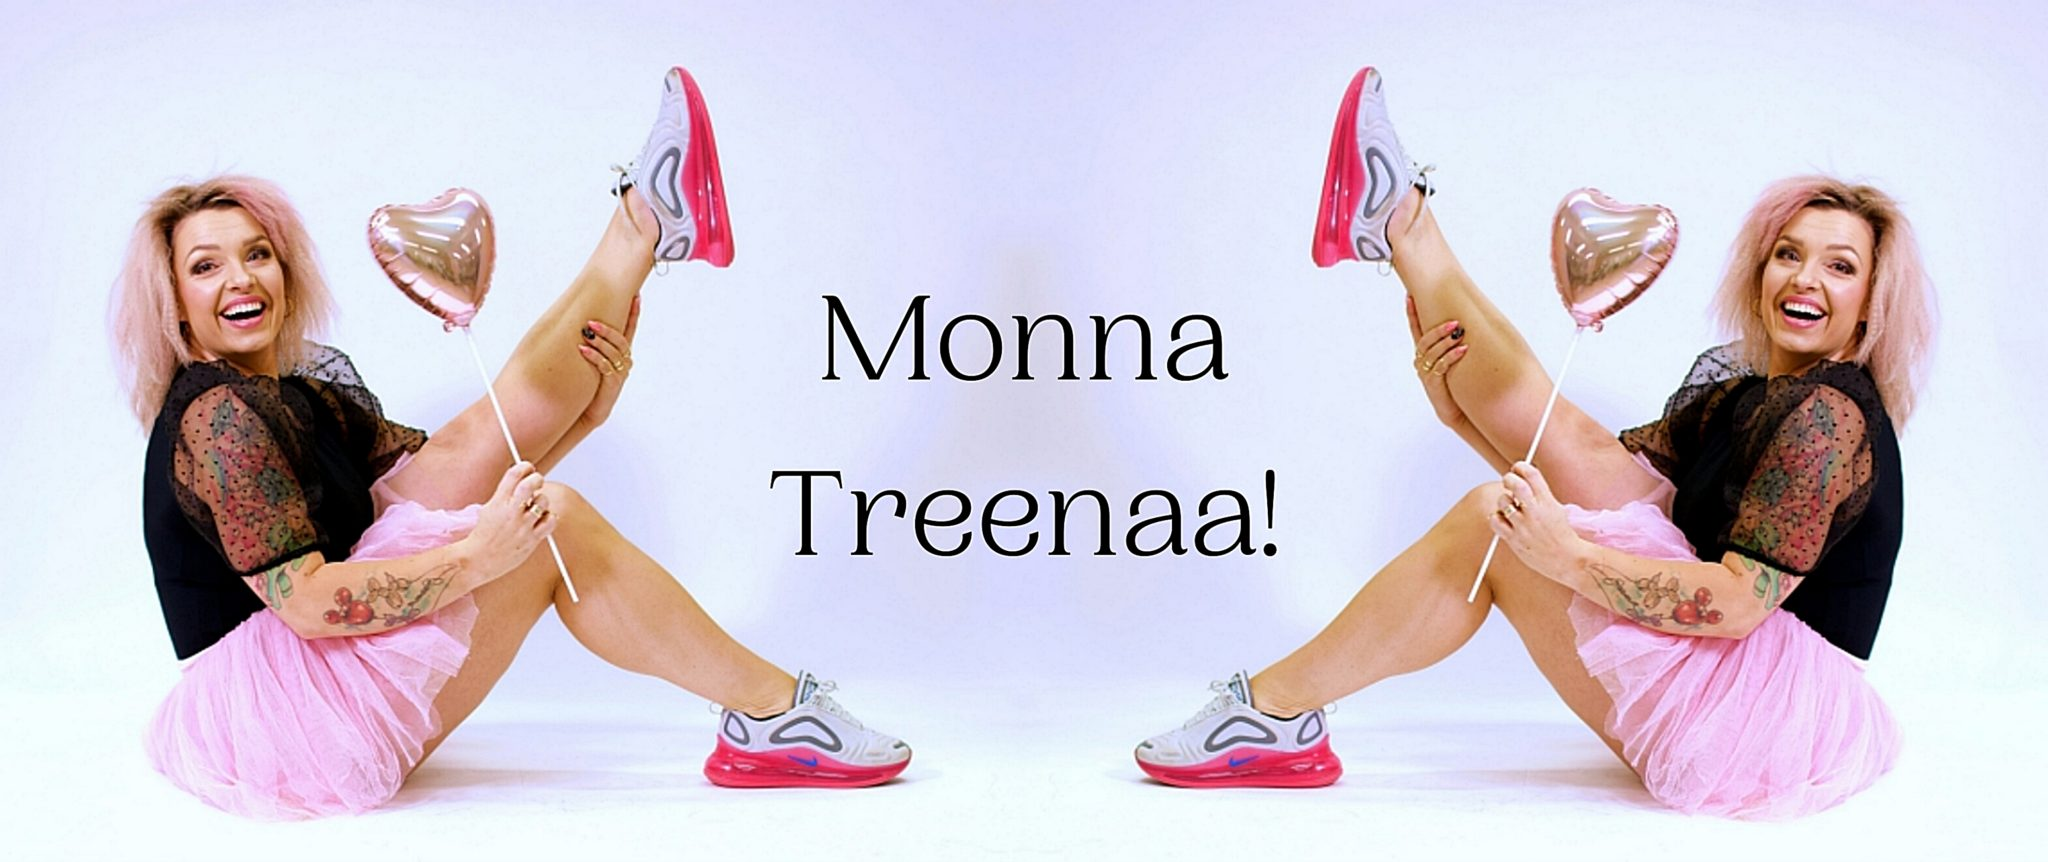 Monna Treenaa